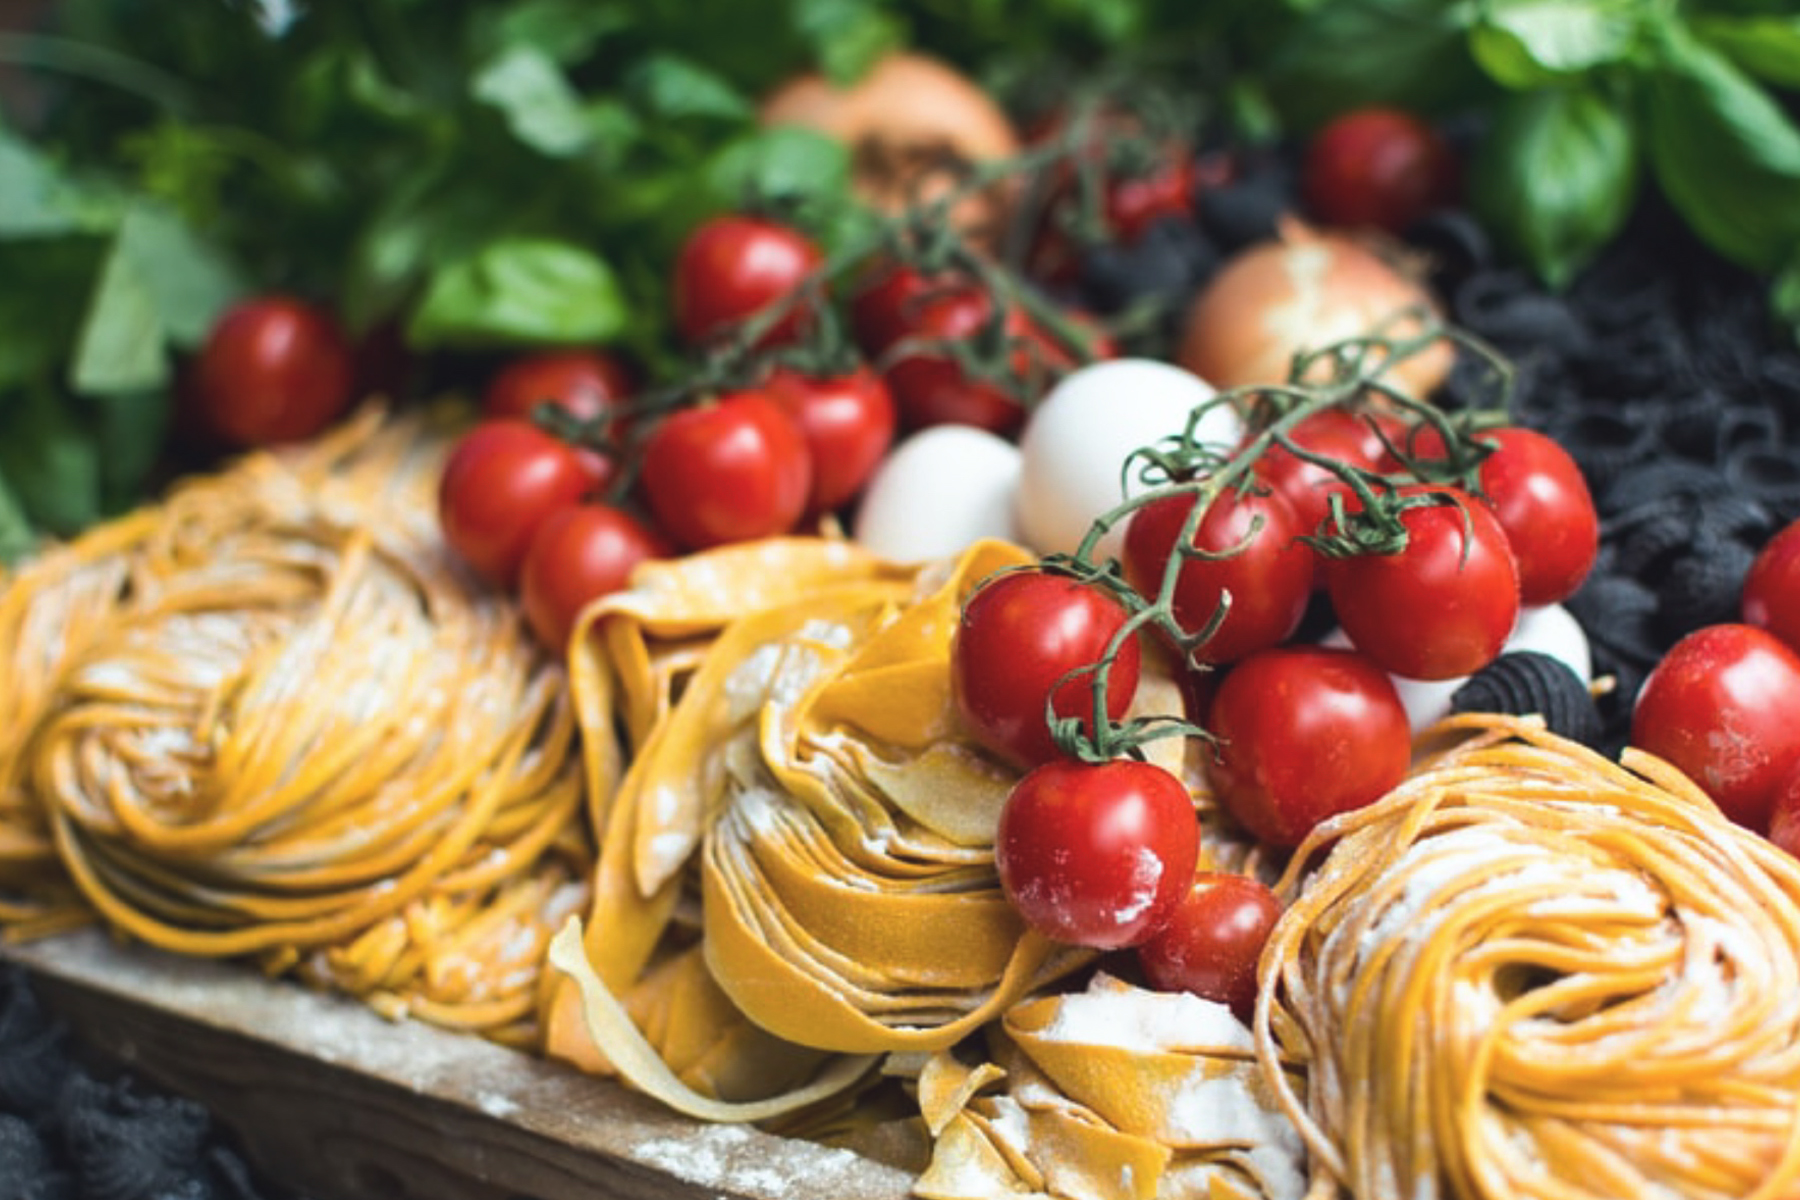 Serie Pasta Koeln 1 Artikel – ©Unsplash